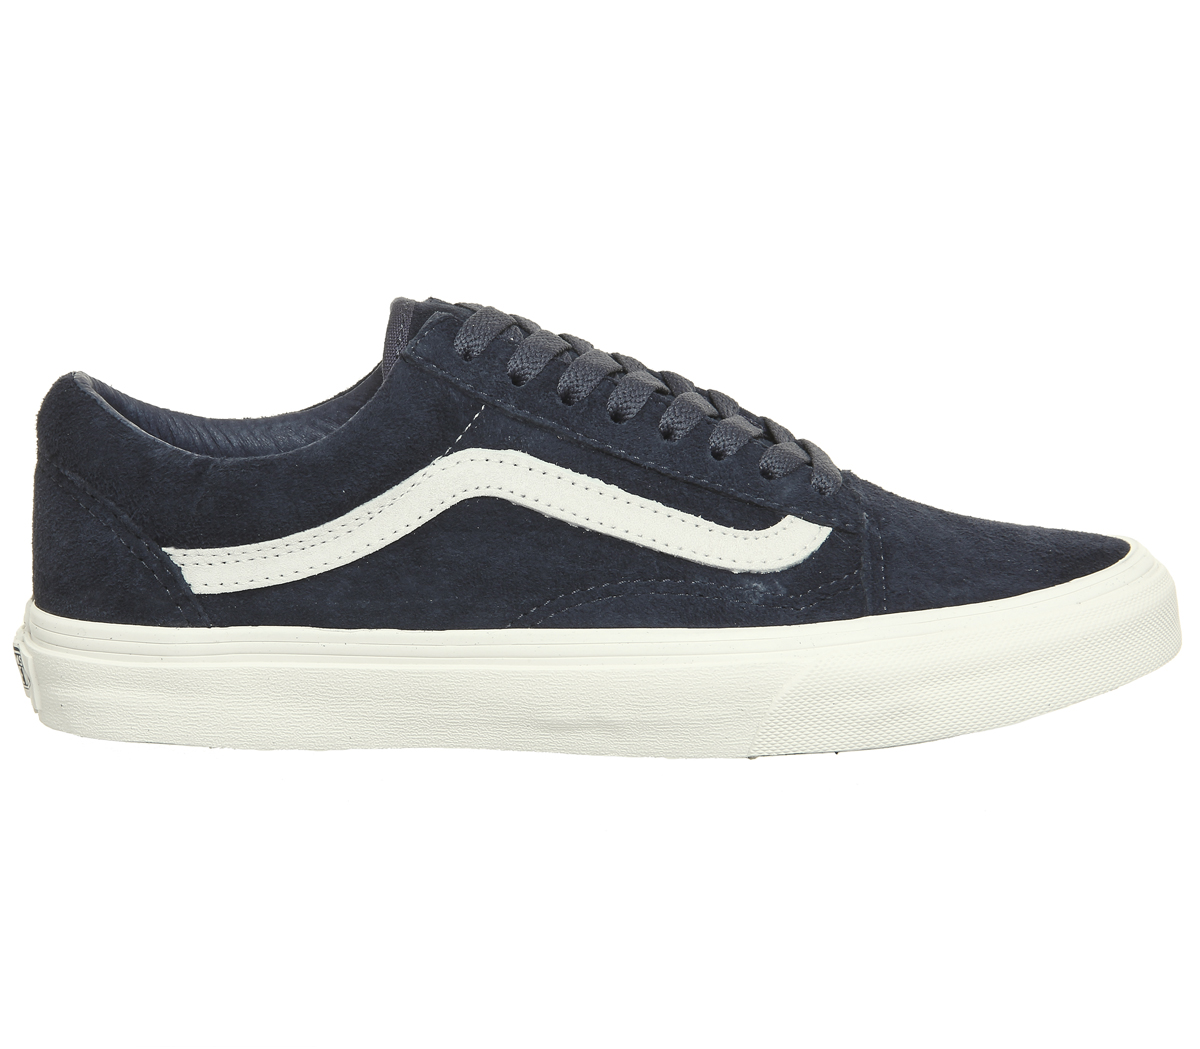 Herren PARISIAN Vans Old Skool Trainers PARISIAN Herren NIGHT BLANC Trainers Schuhes 077a5a